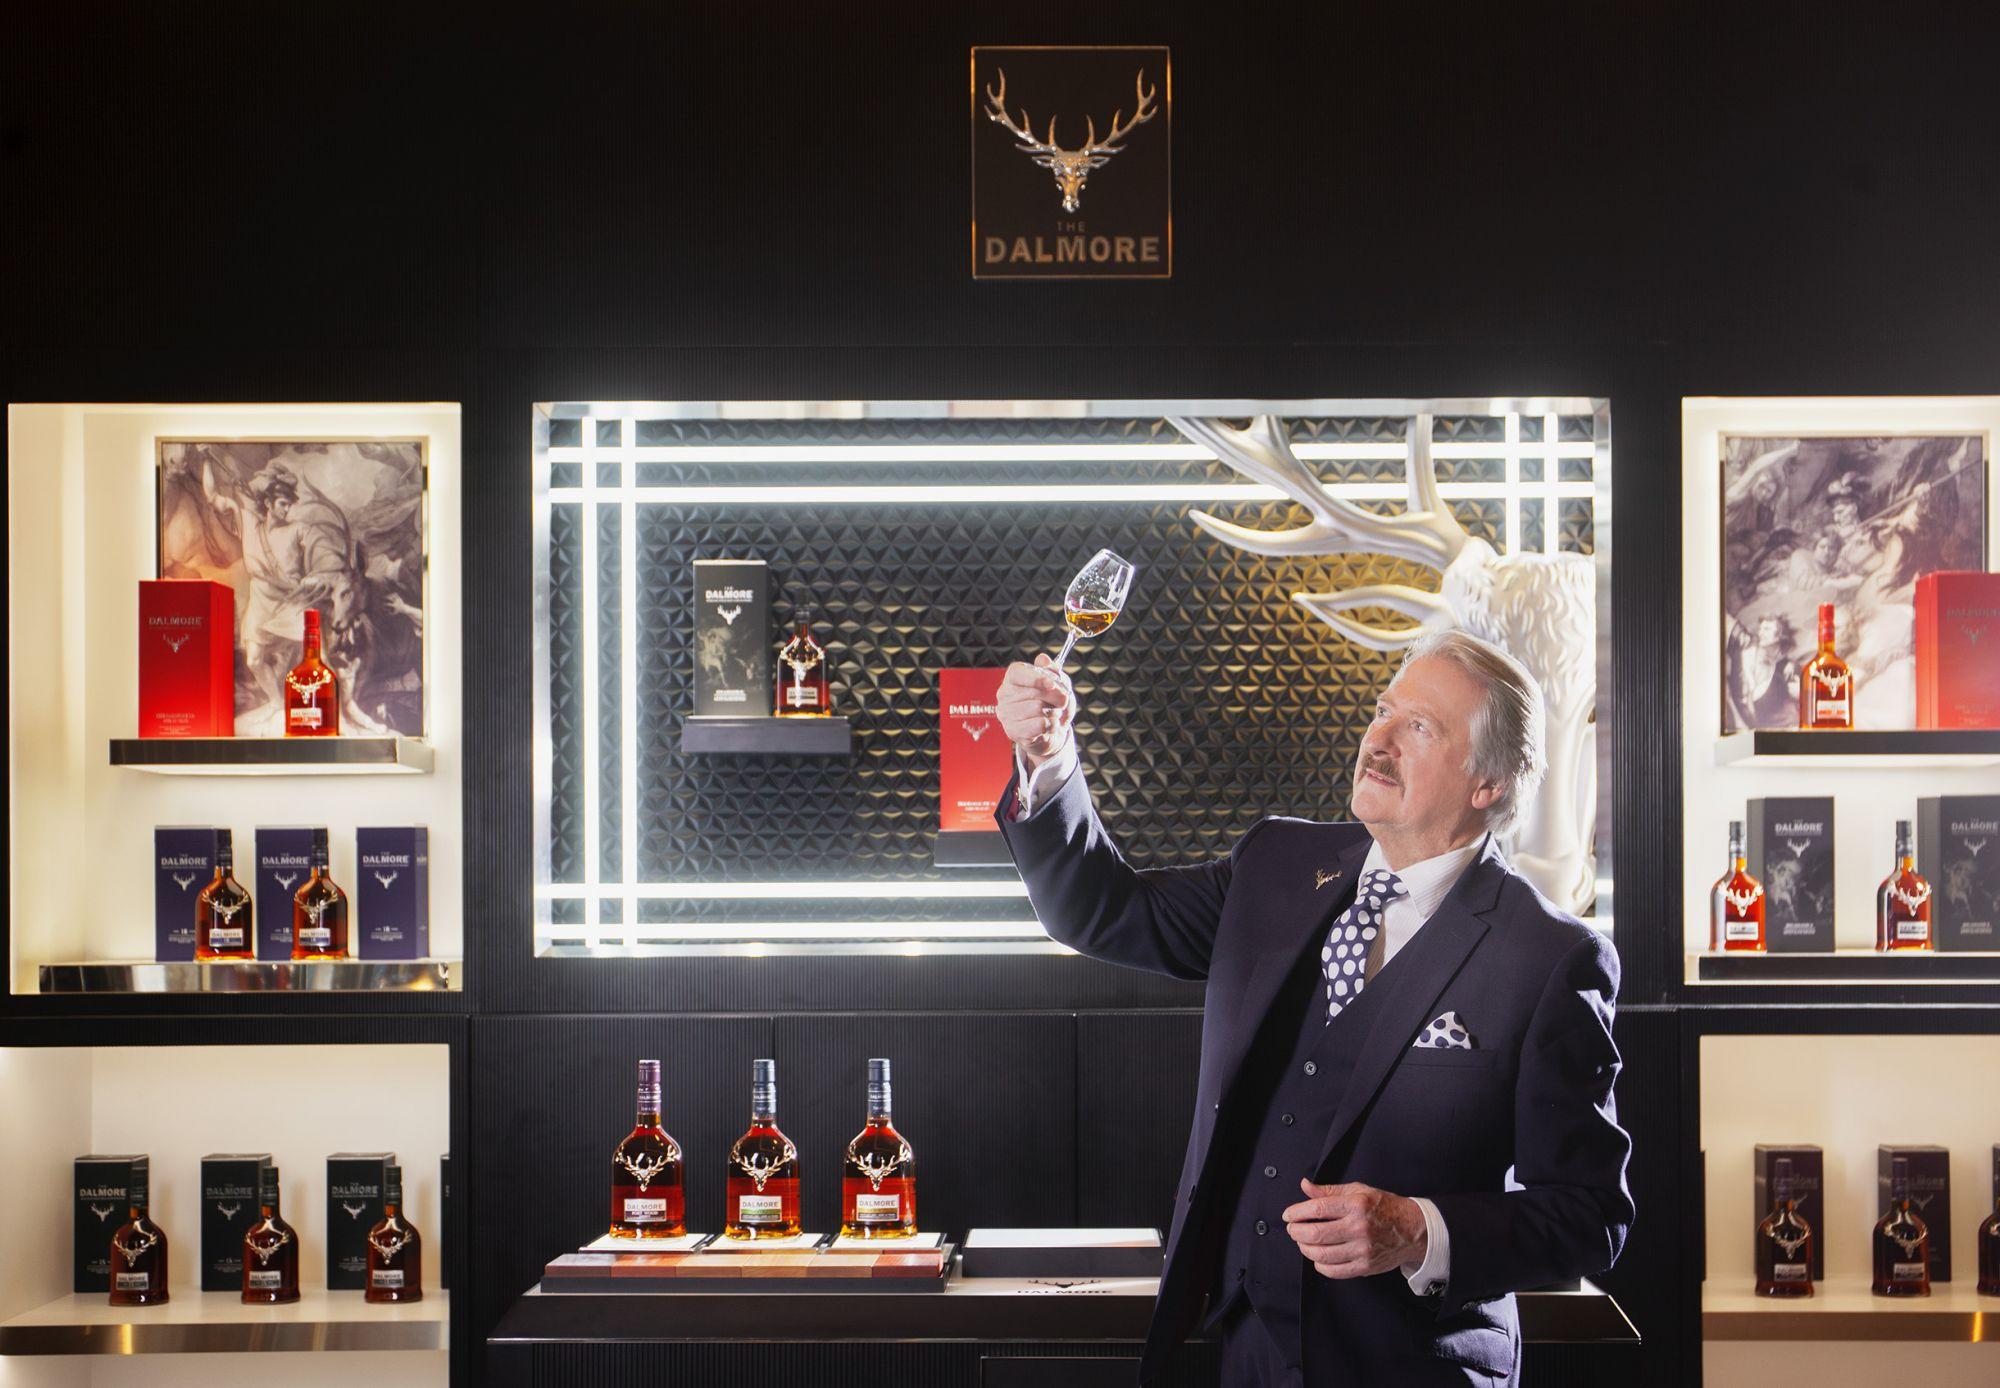 The Dalmore 大摩首席釀酒師 Richard Paterson:「我從不感到滿足,總是在尋覓更好的可能性。」